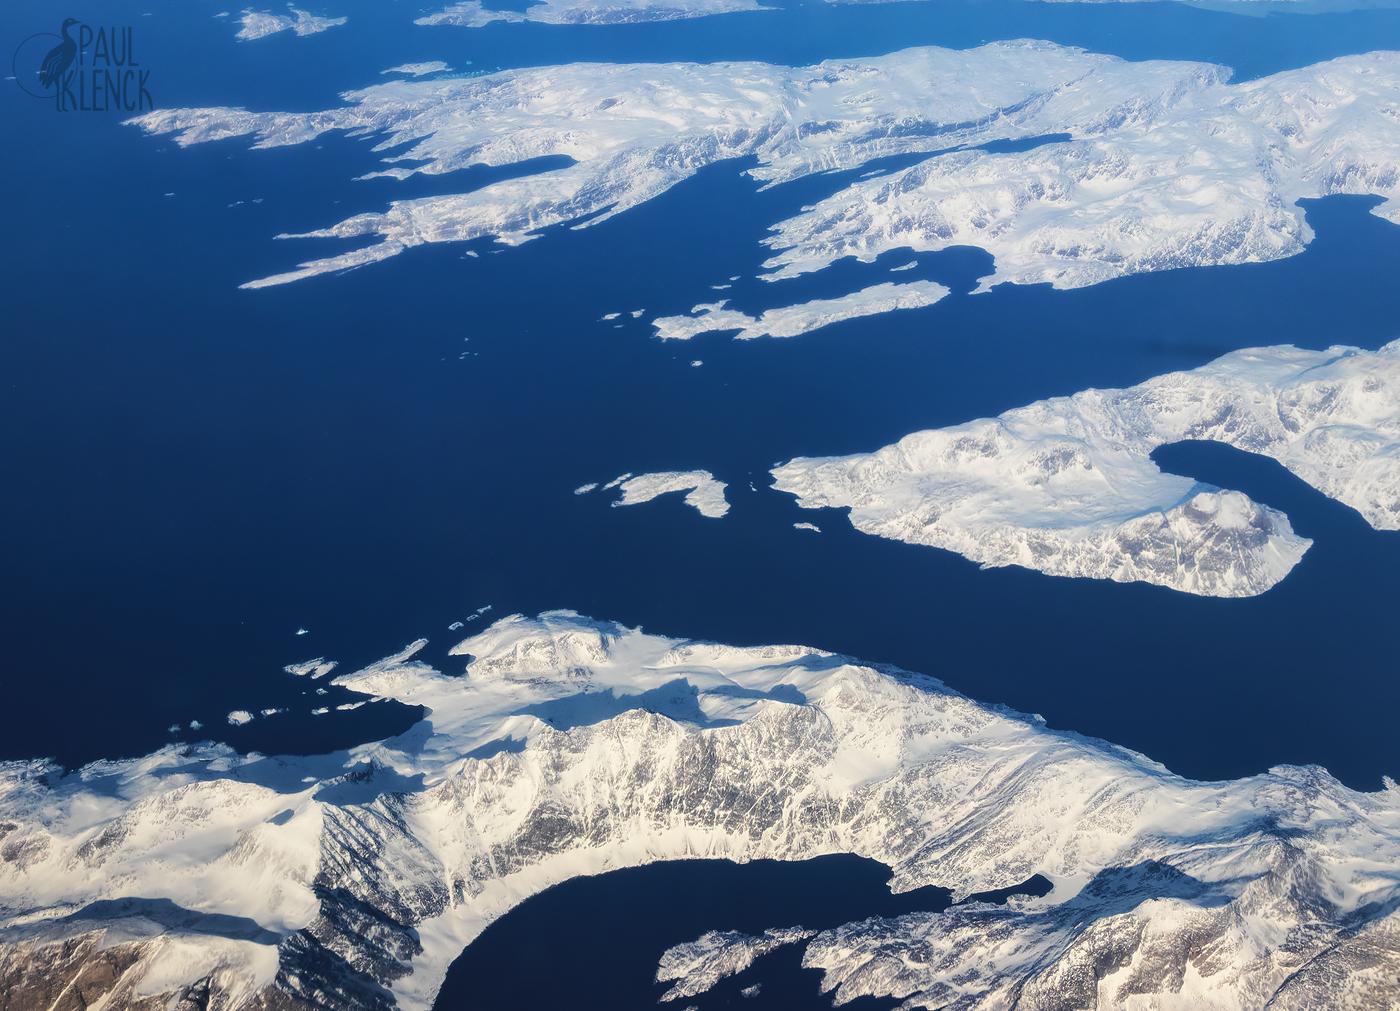 Lands end, east coast Greenland